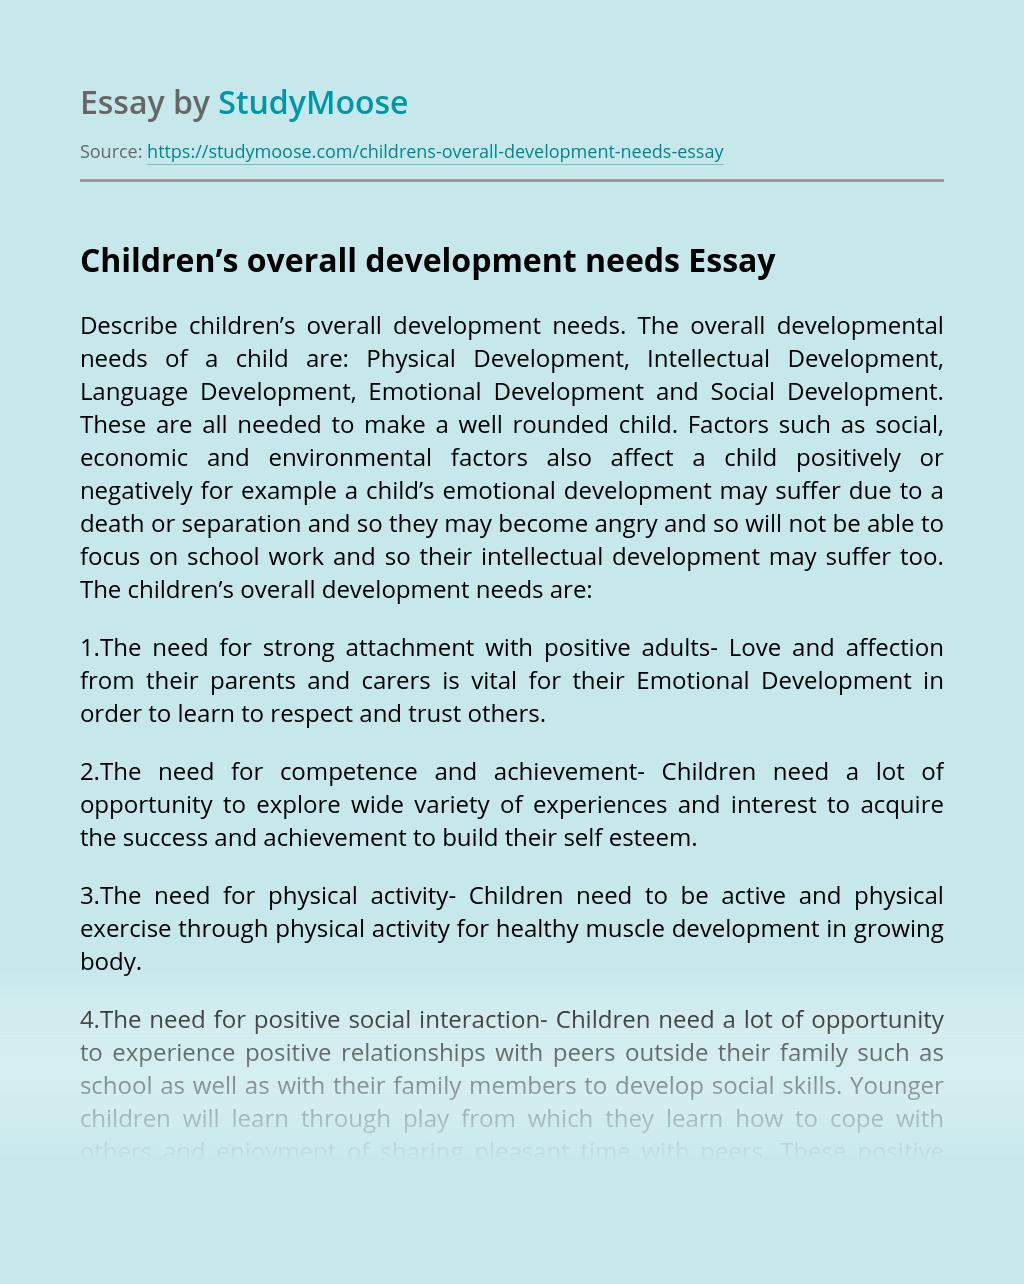 Children's overall development needs